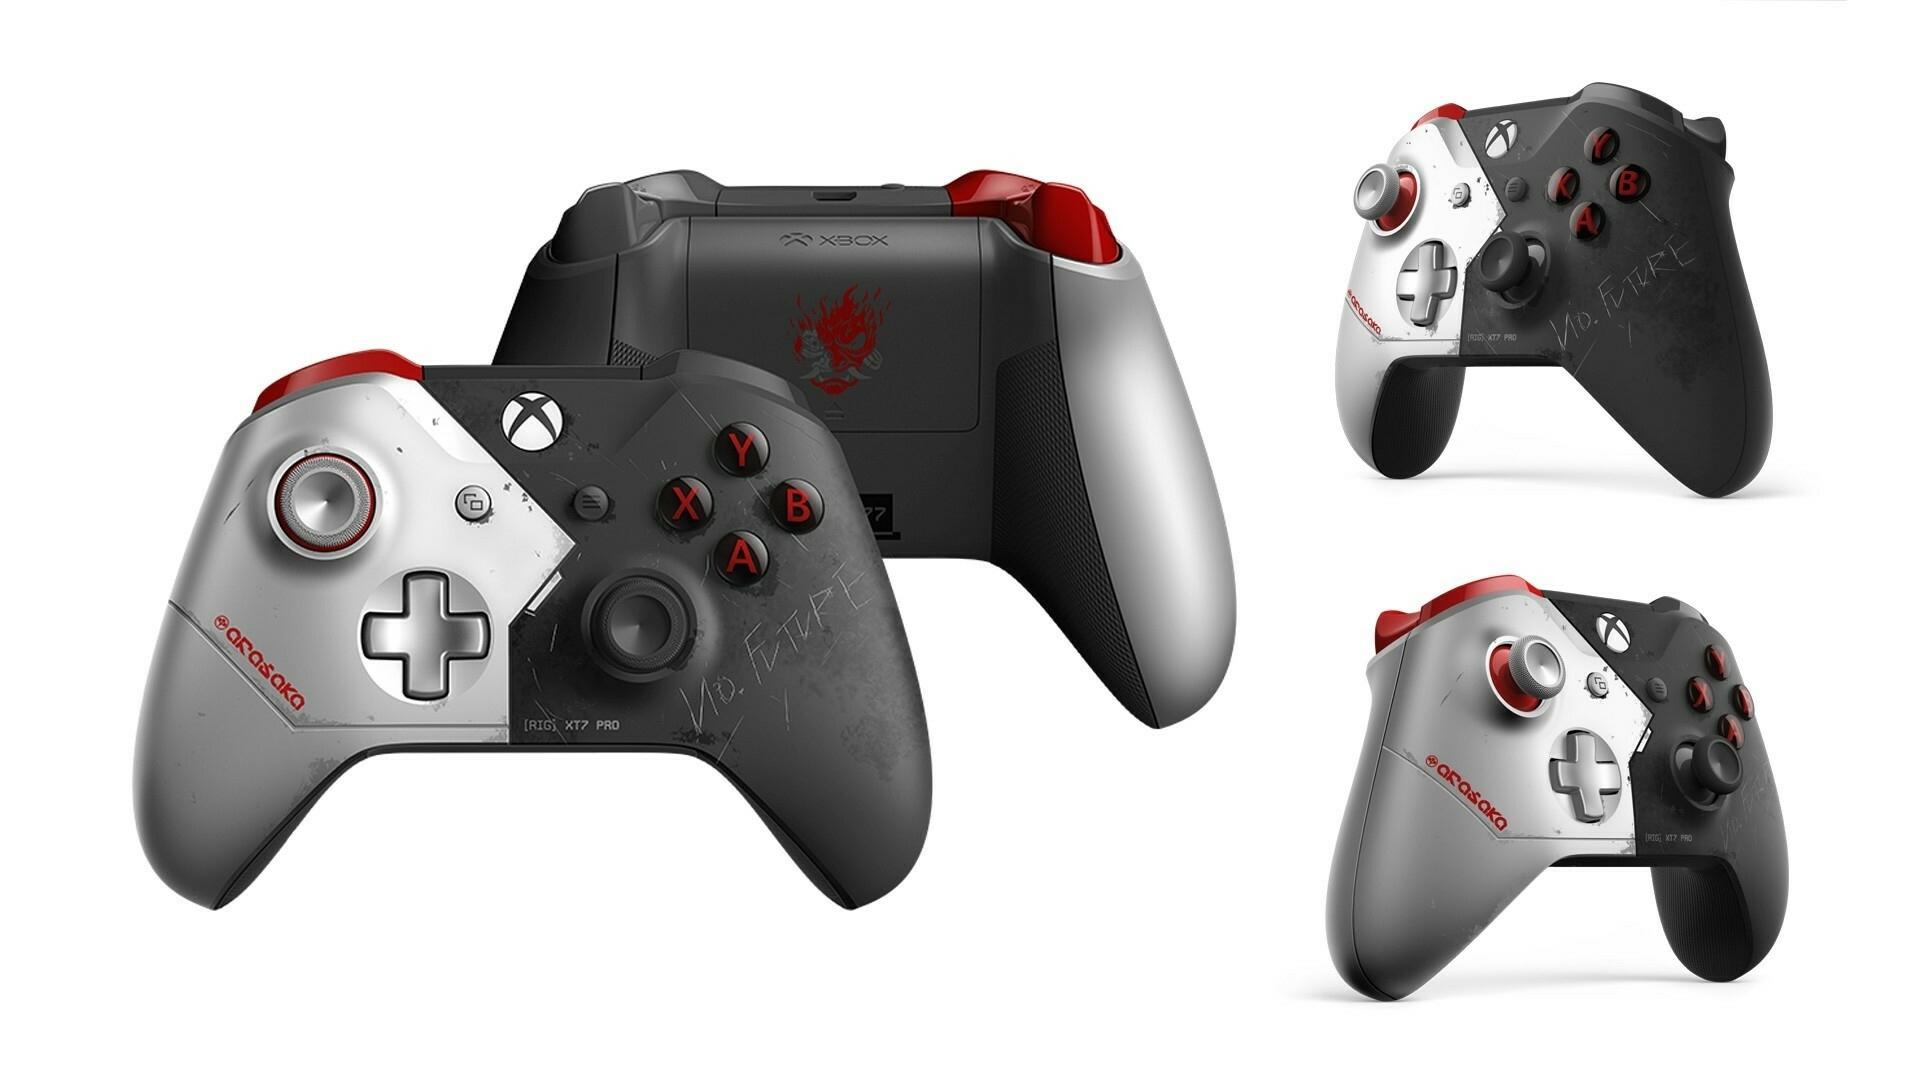 Xbox Wireless Controller Cyberpunk 2077 Limited Edition